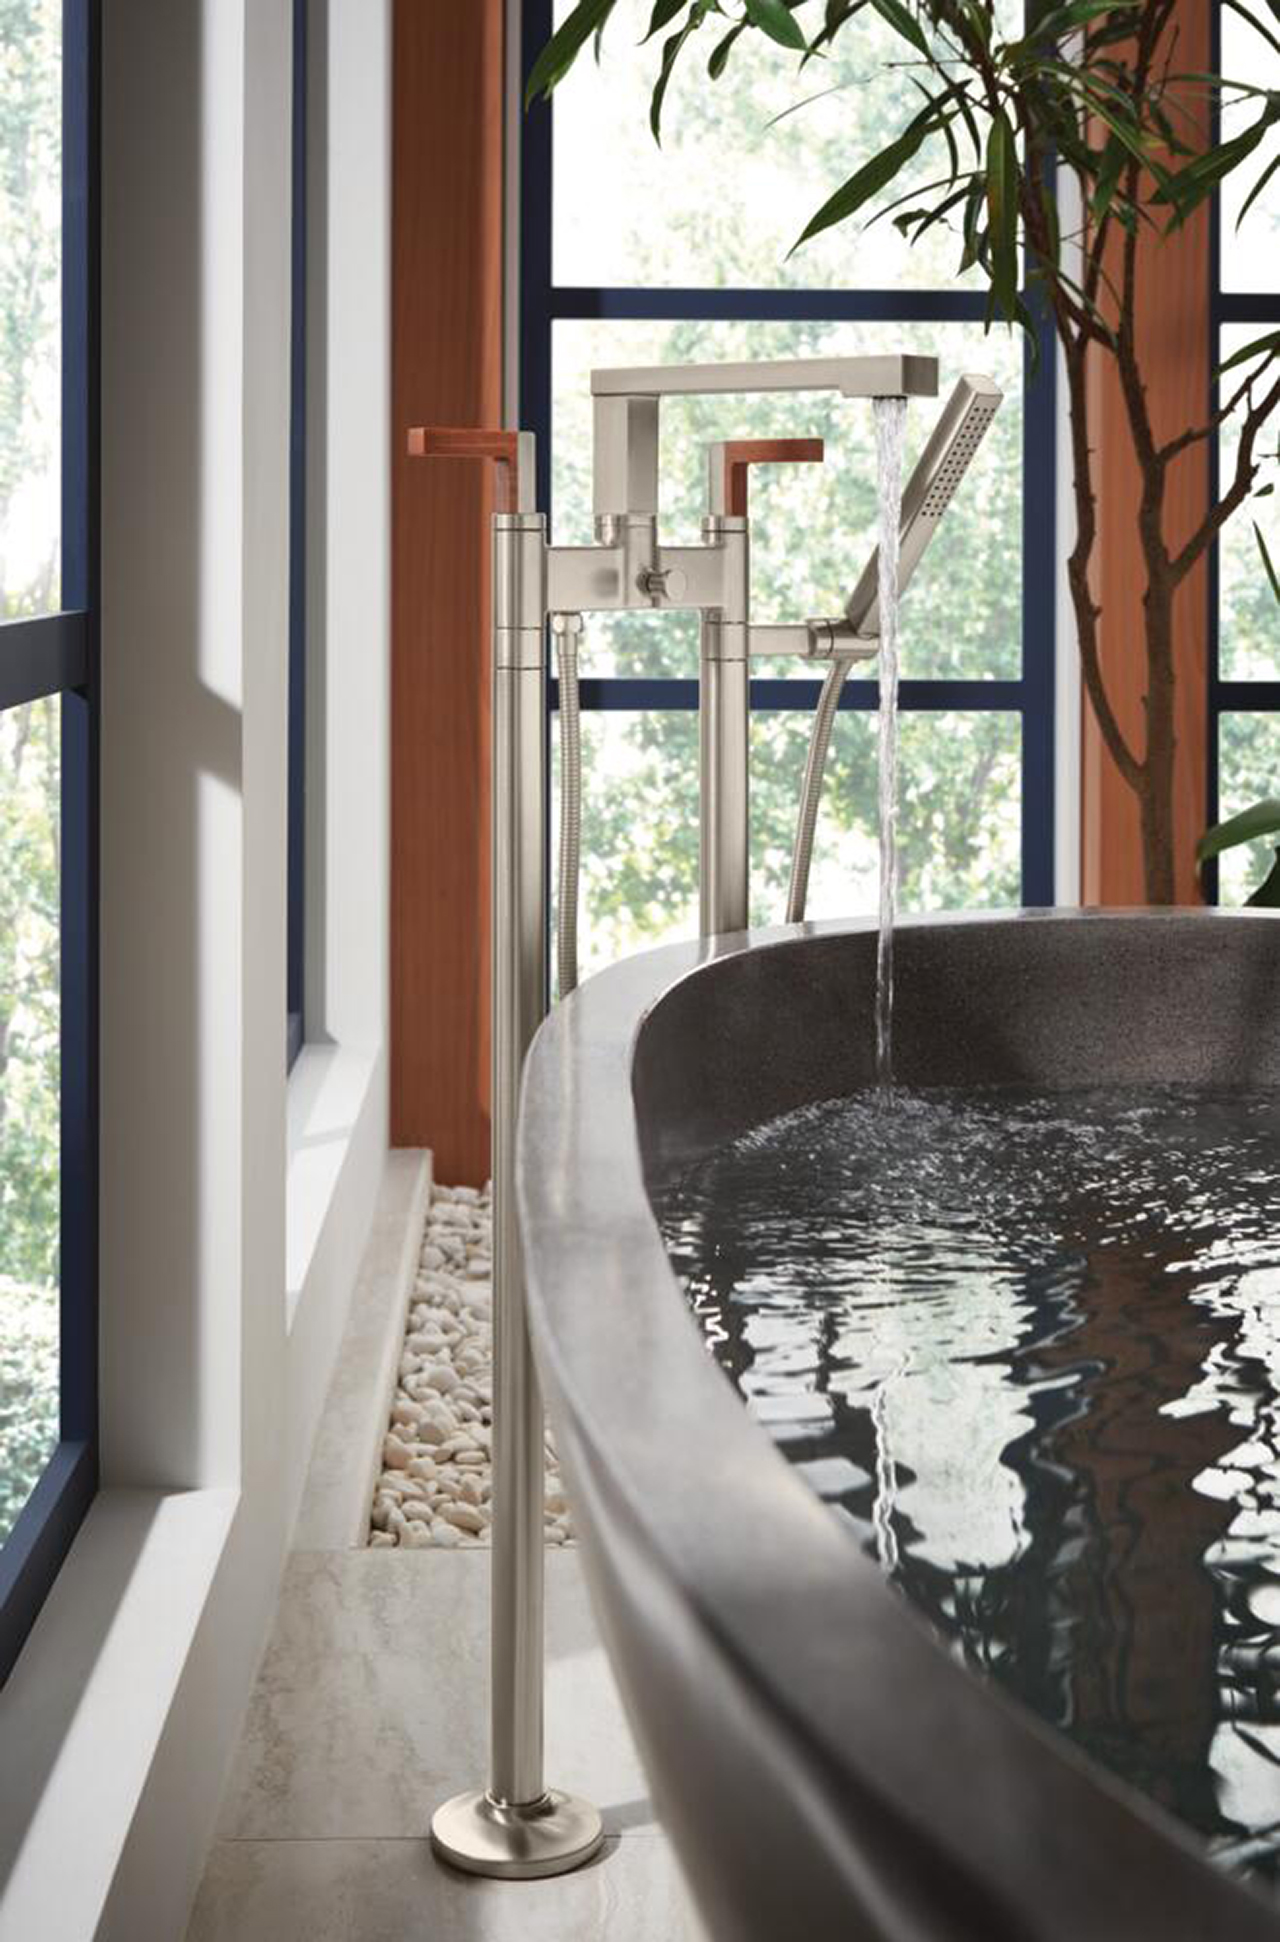 corner of dark grey bathtub with metal rub filler surrounded by windows